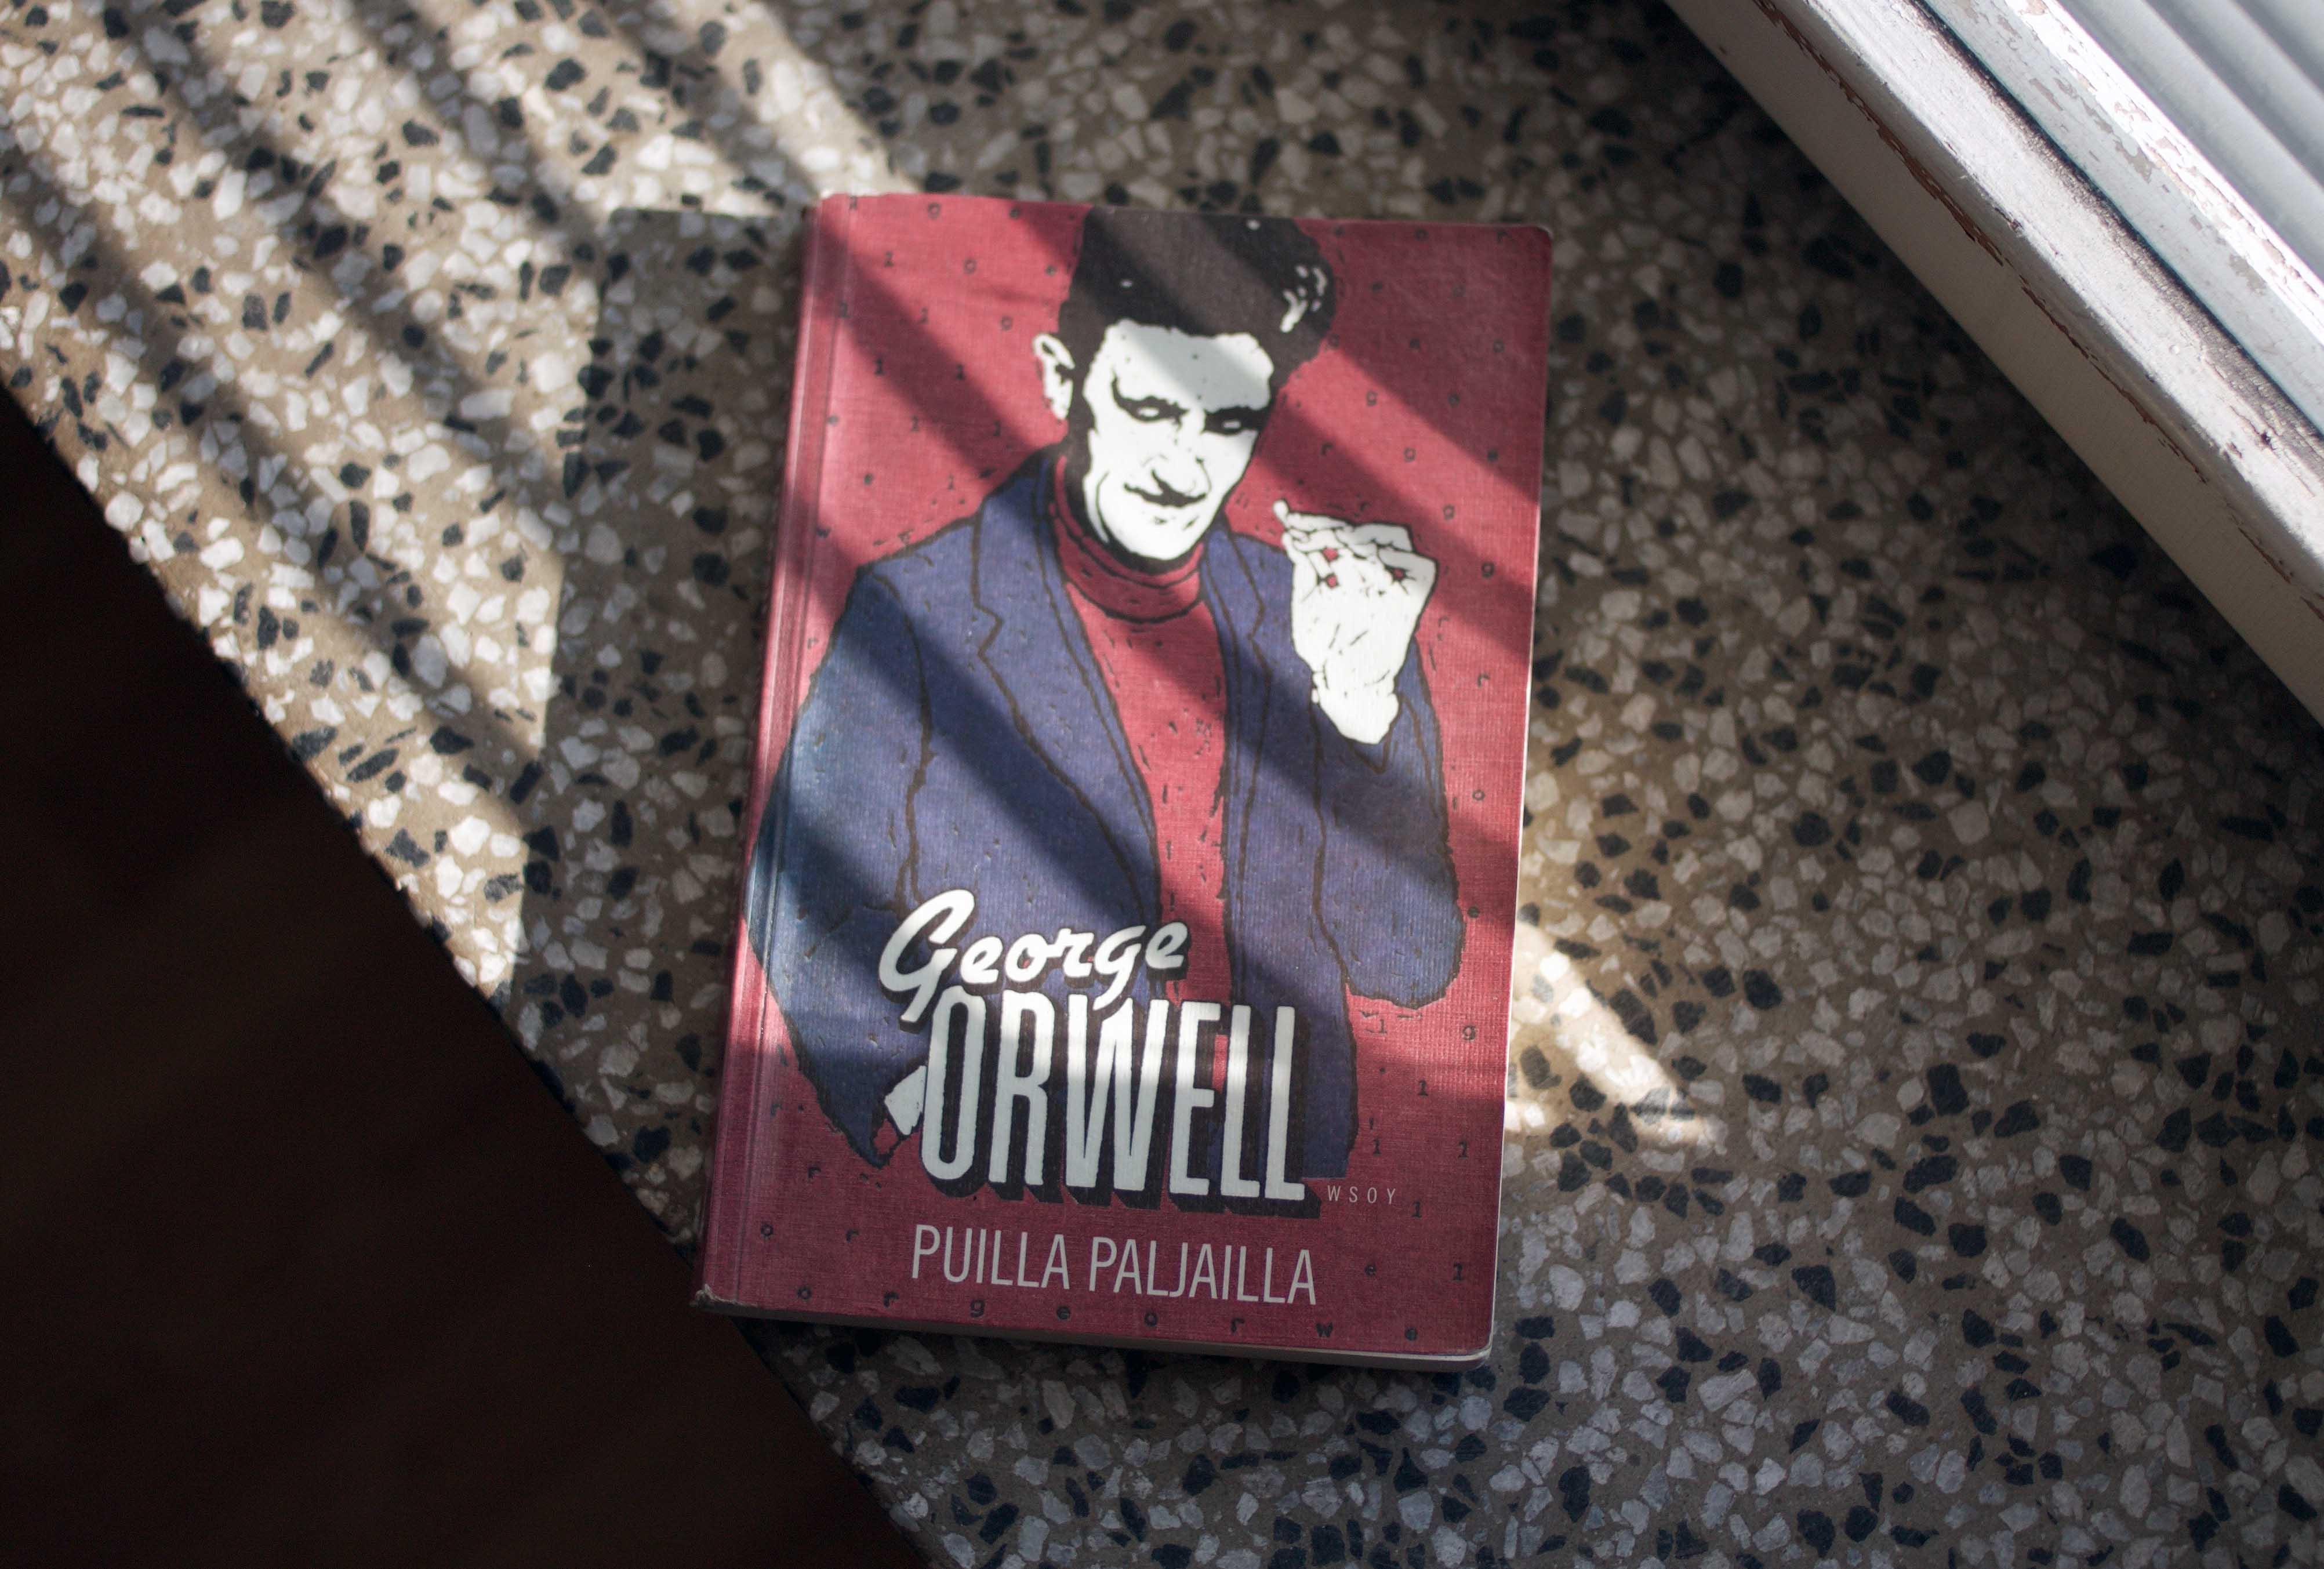 George Orwell: Puilla paljailla